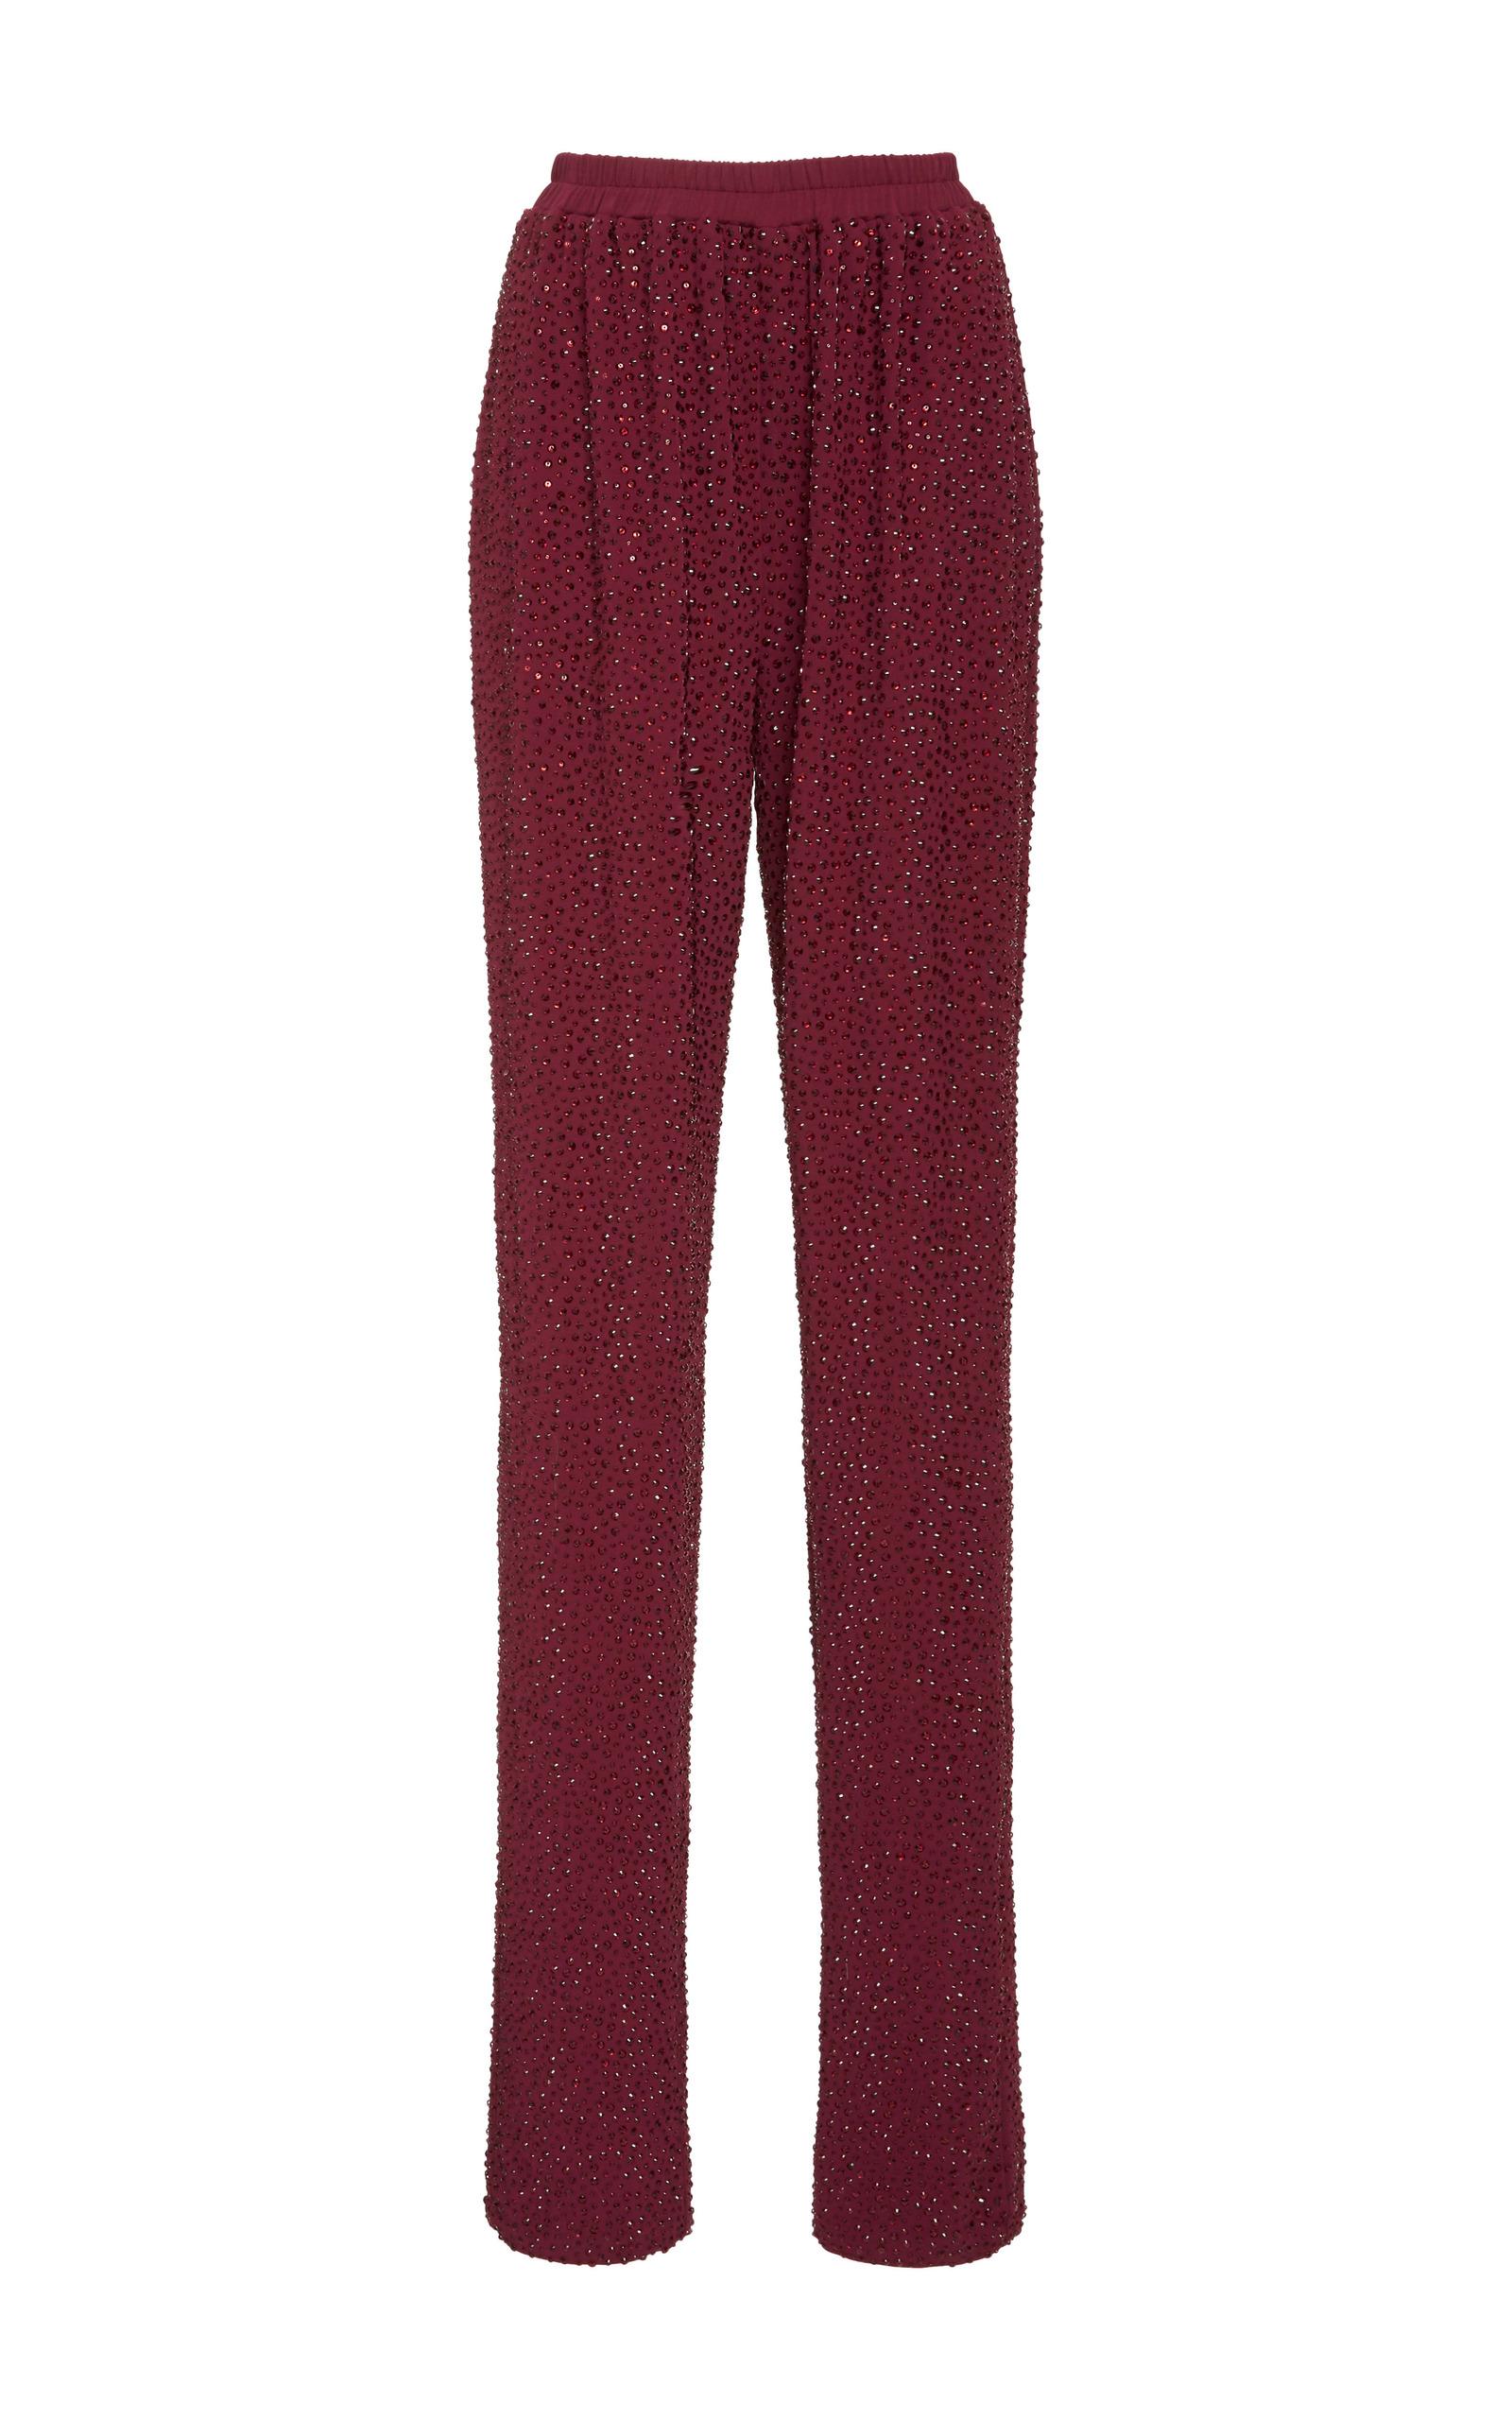 large_michael-kors-red-crystal-pajama-pant.jpg